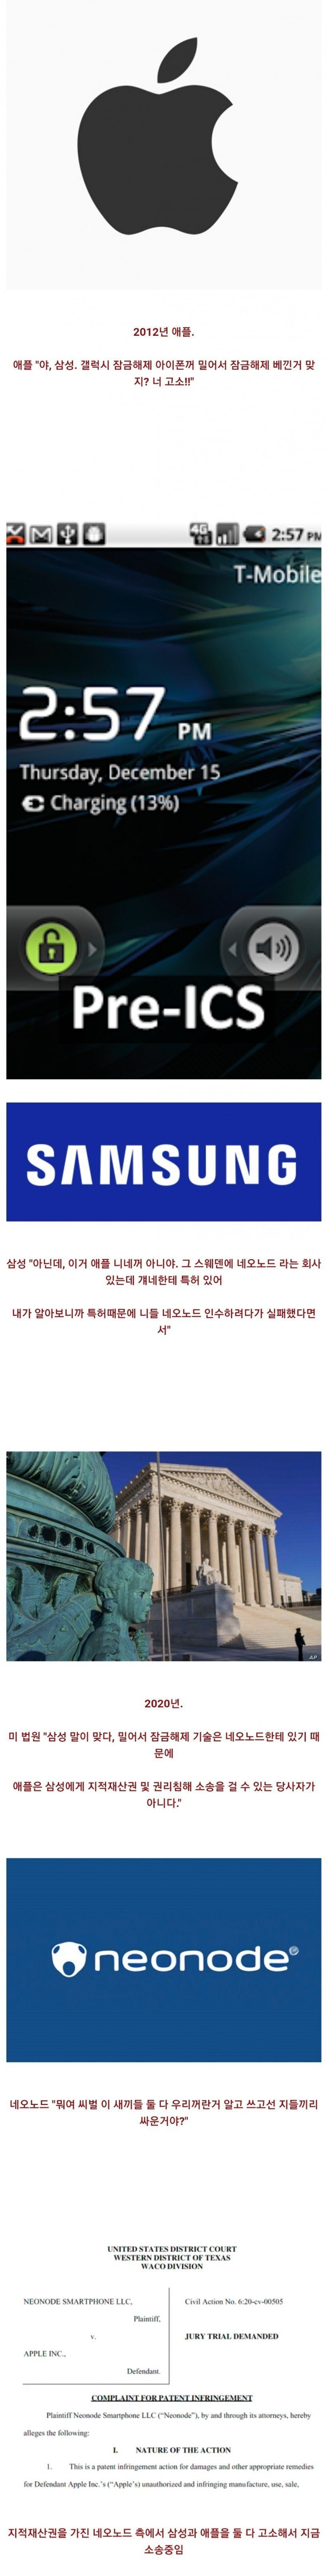 viewimage.php?id=25bcd827edd330a7&no=24b0d769e1d32ca73cec83fa11d0283146e1de228a7923f189a7bd559a207e6760cf3f891c6aba4311965ed0044da44c779f1017cecc0ef3eace467c347600aedfc2d8b9faa115ee8e9c1d8f1243dd0cd192829c1fdd2f5fc1d789b1b9633226e79e22aa88